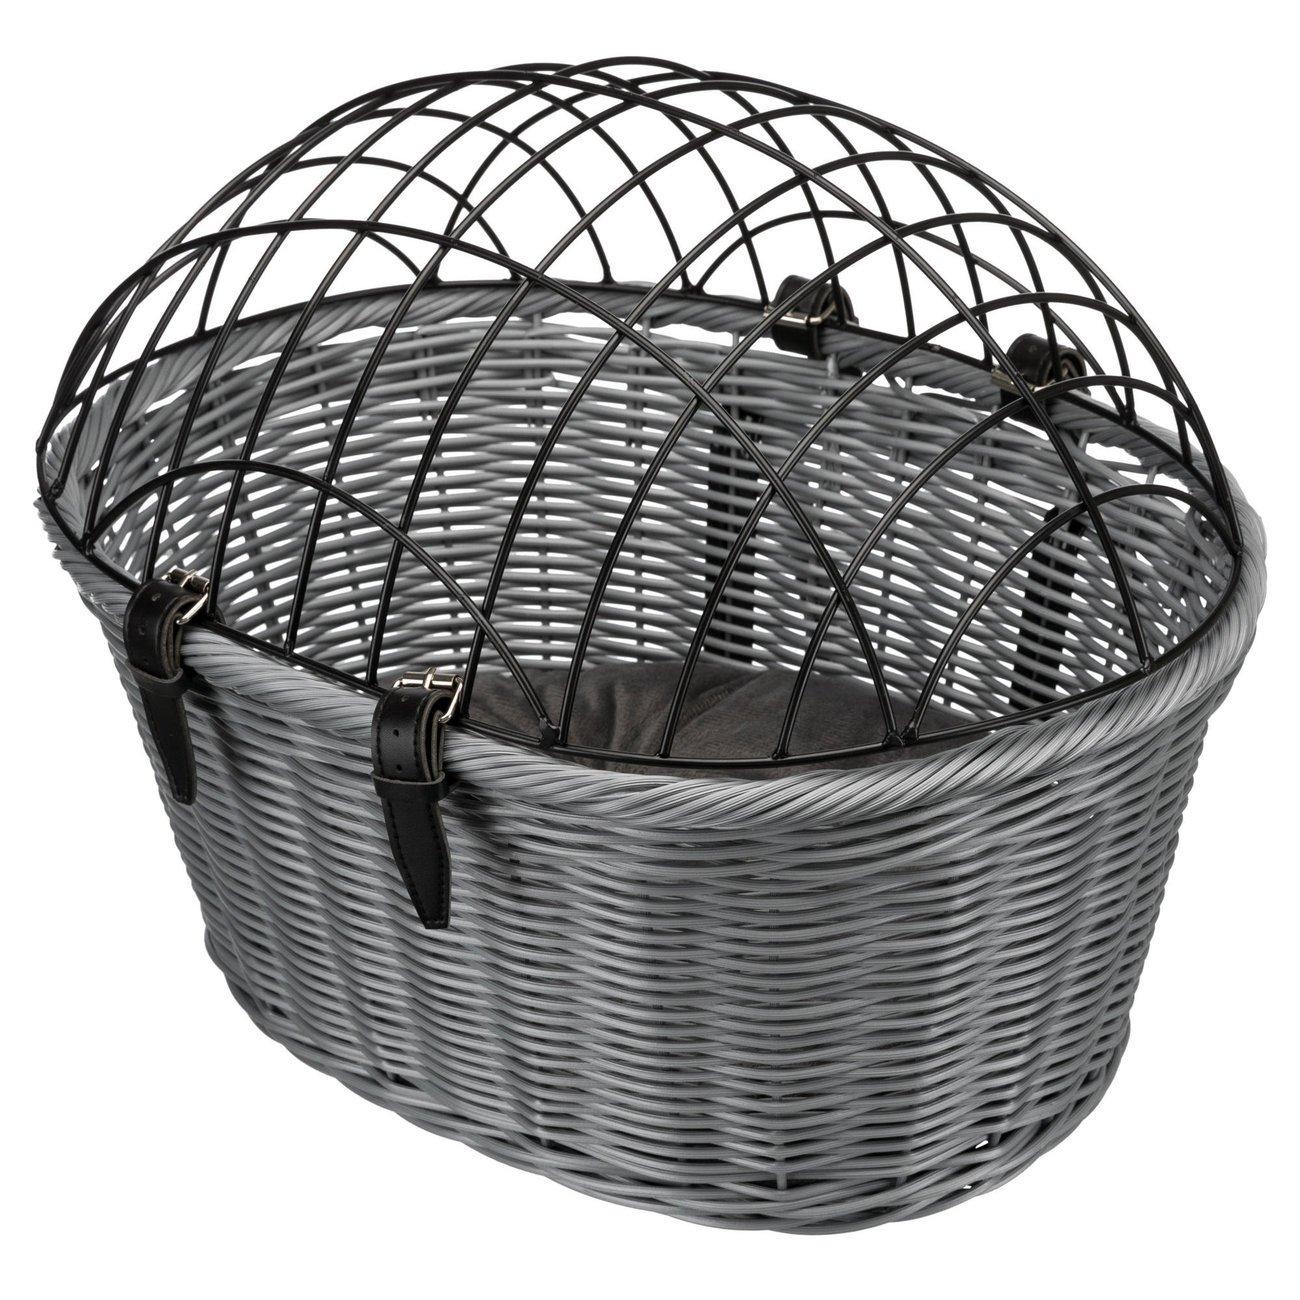 Trixie Fahrradkorb aus Polyrattan mit Gitter, 44 × 34 × 35 cm, grau